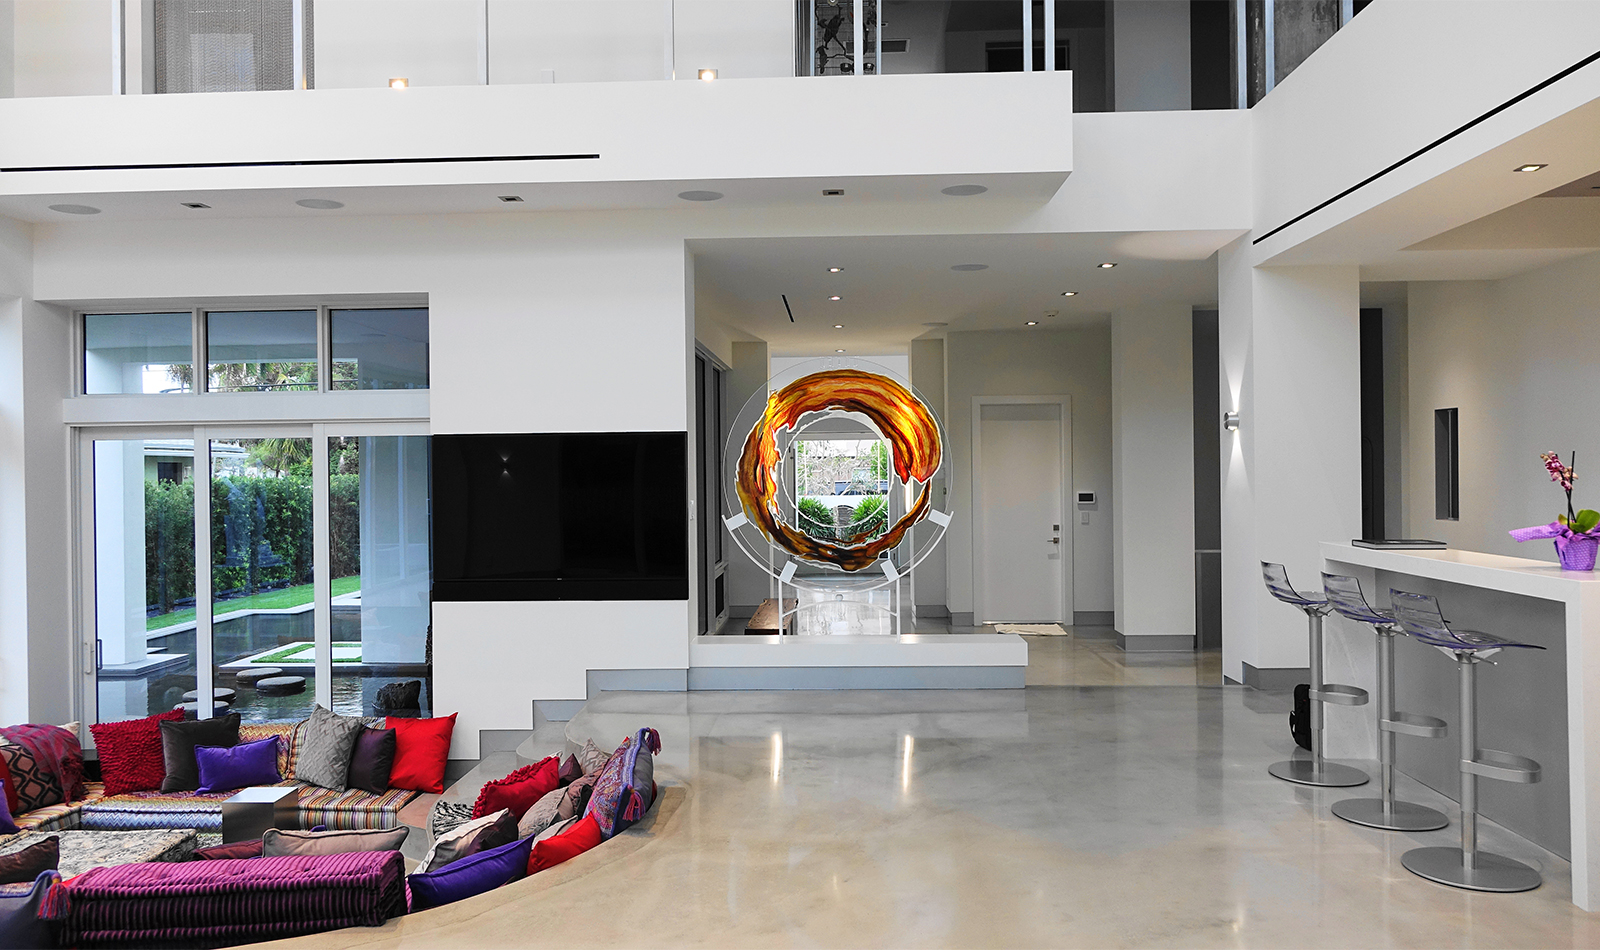 Merveilleux Copyright © 2018 Interiors By Shelly Preziosi | Website Designed By: IBI Designs  Boca Raton.